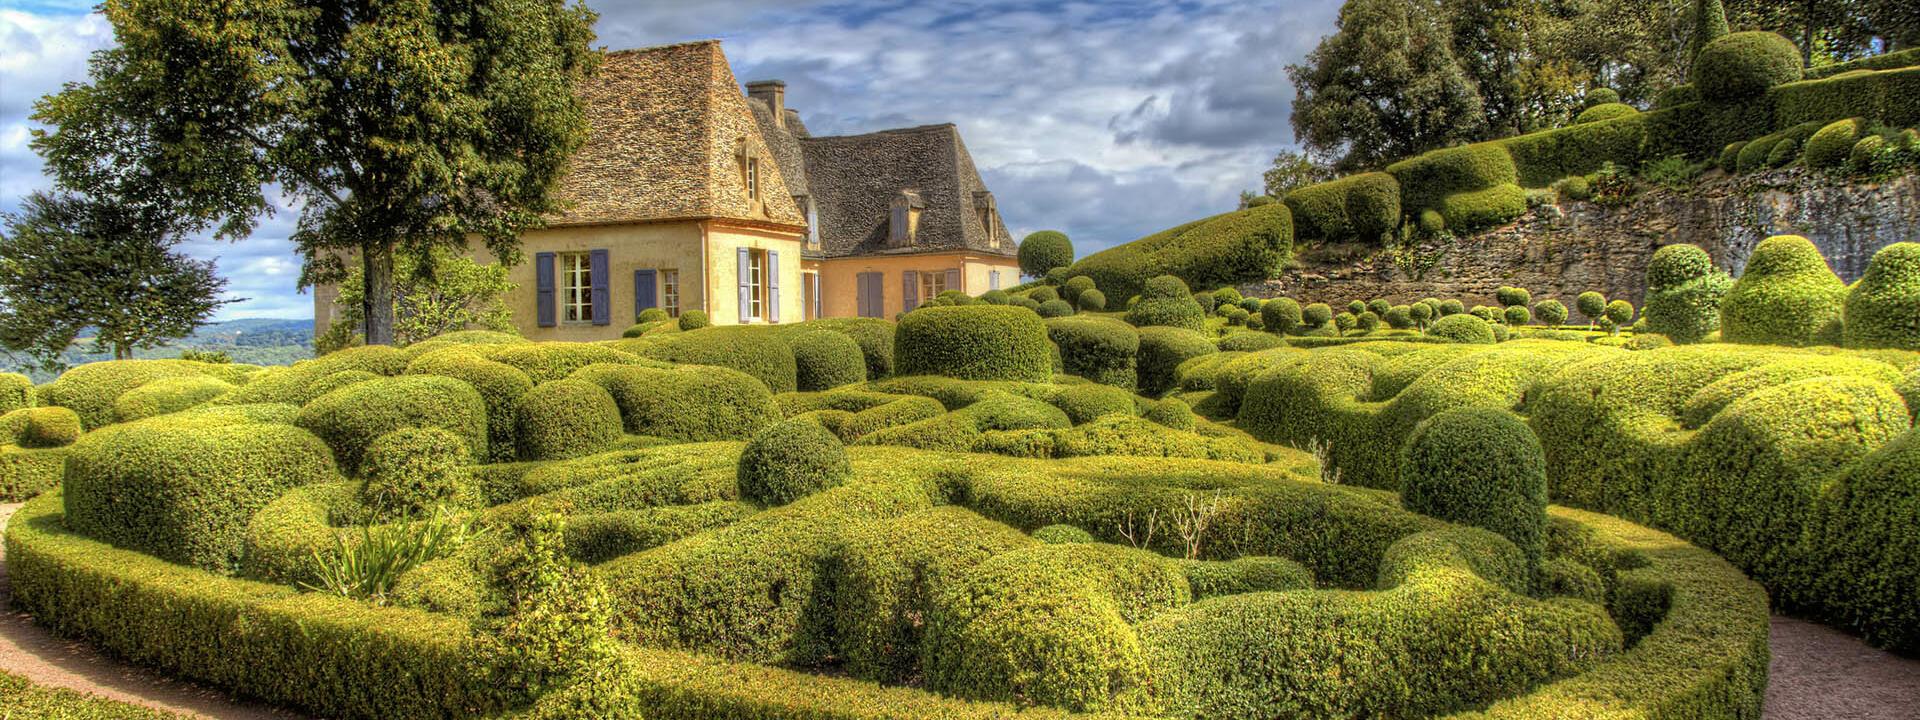 Five Unmissable Gardens in the Dordogne